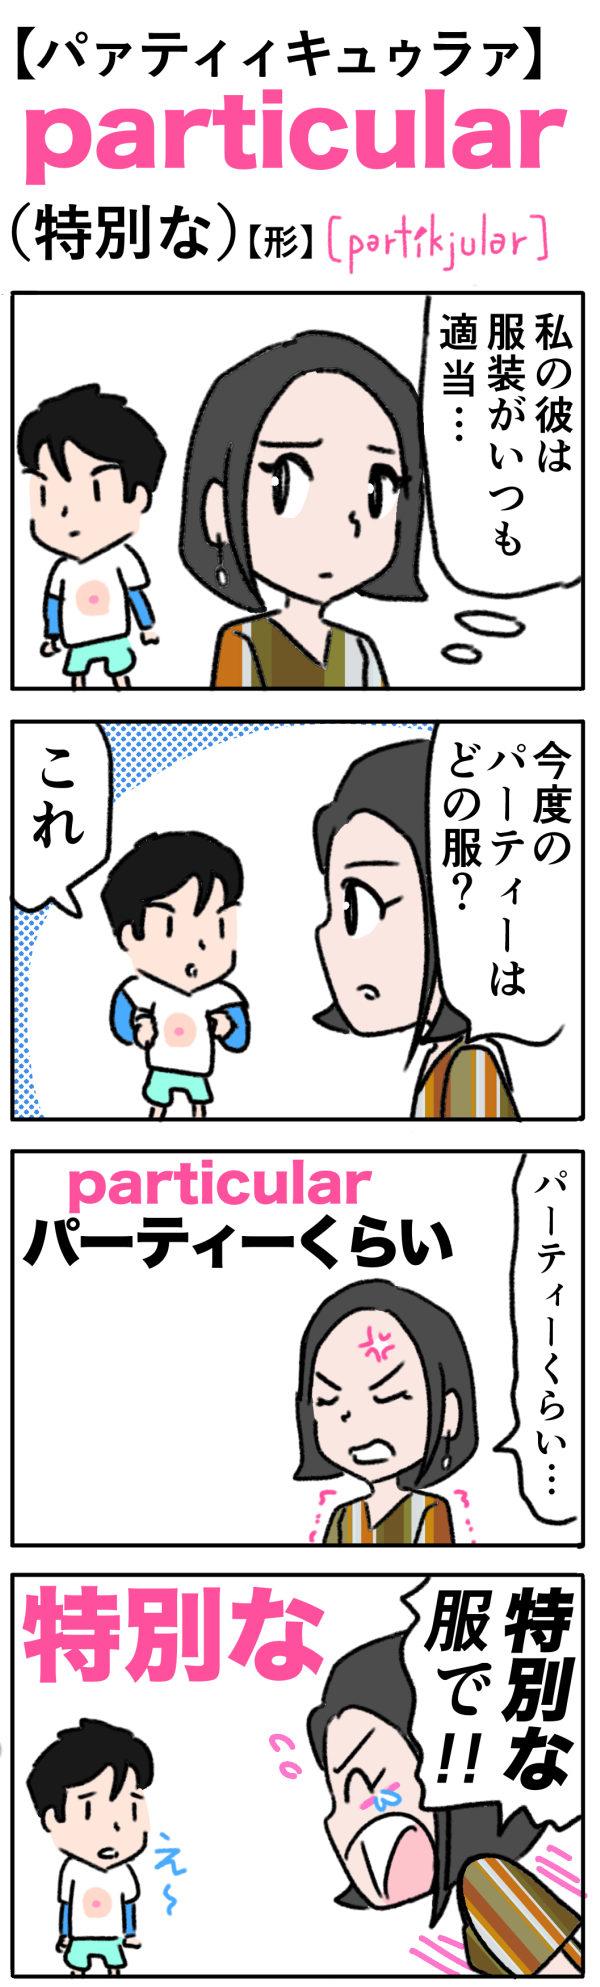 particular(特別な)の語呂合わせ英単語